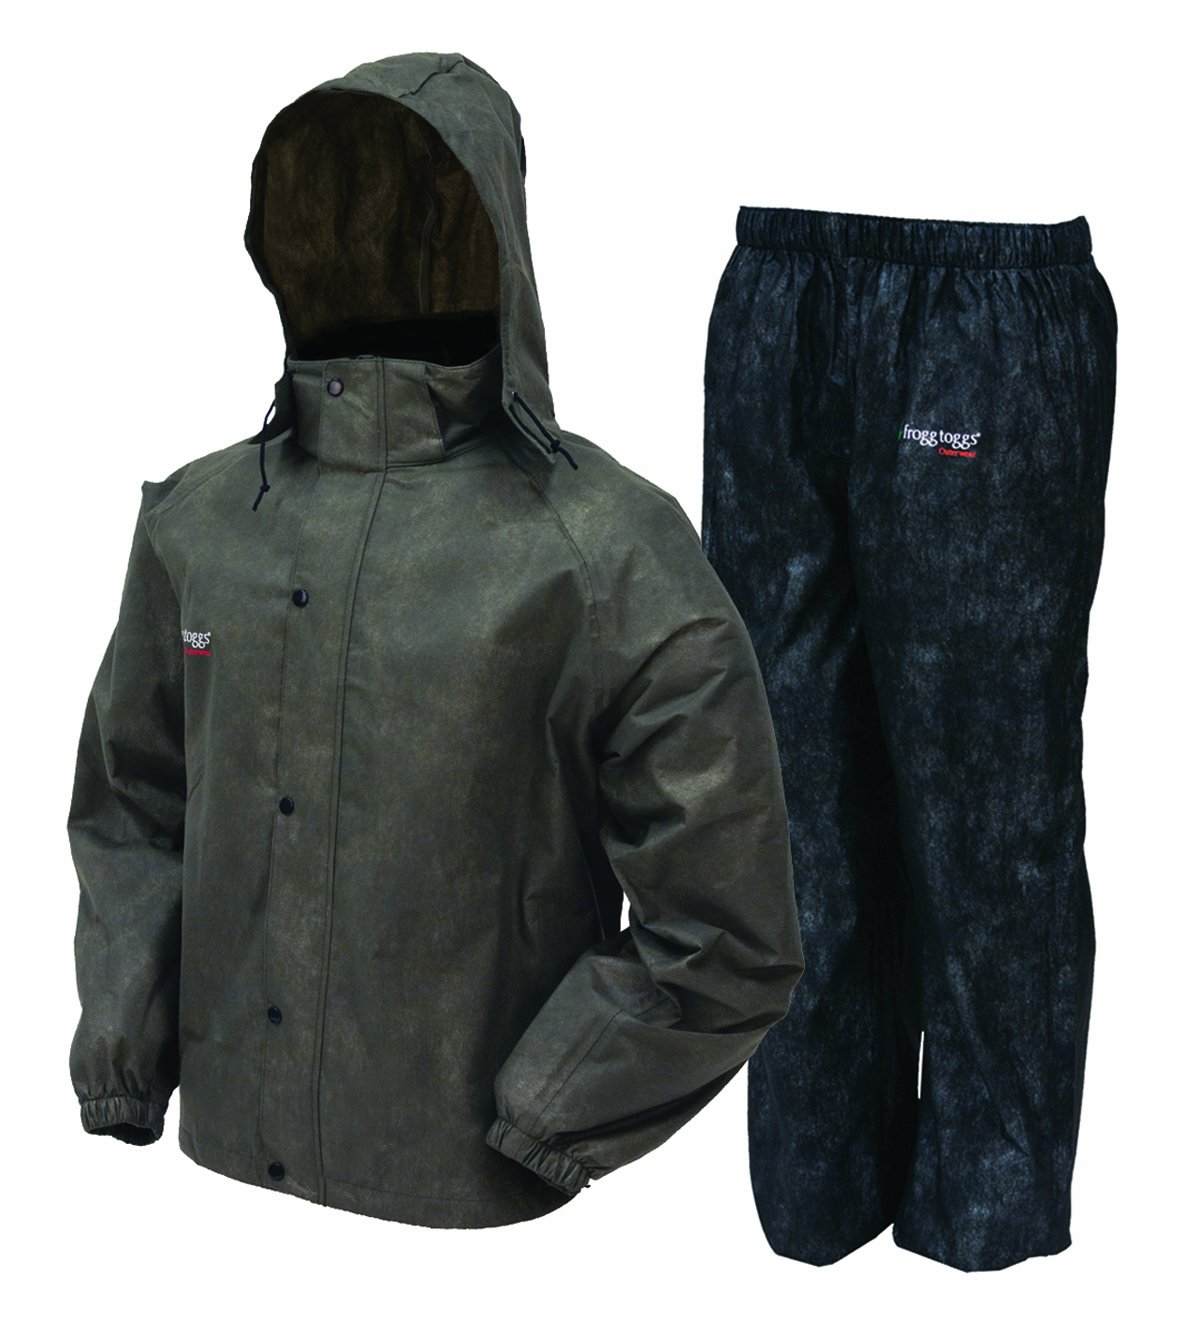 Frogg Toggs Men's All Sports Rain and Wind Suit, Stone/Black, Medium